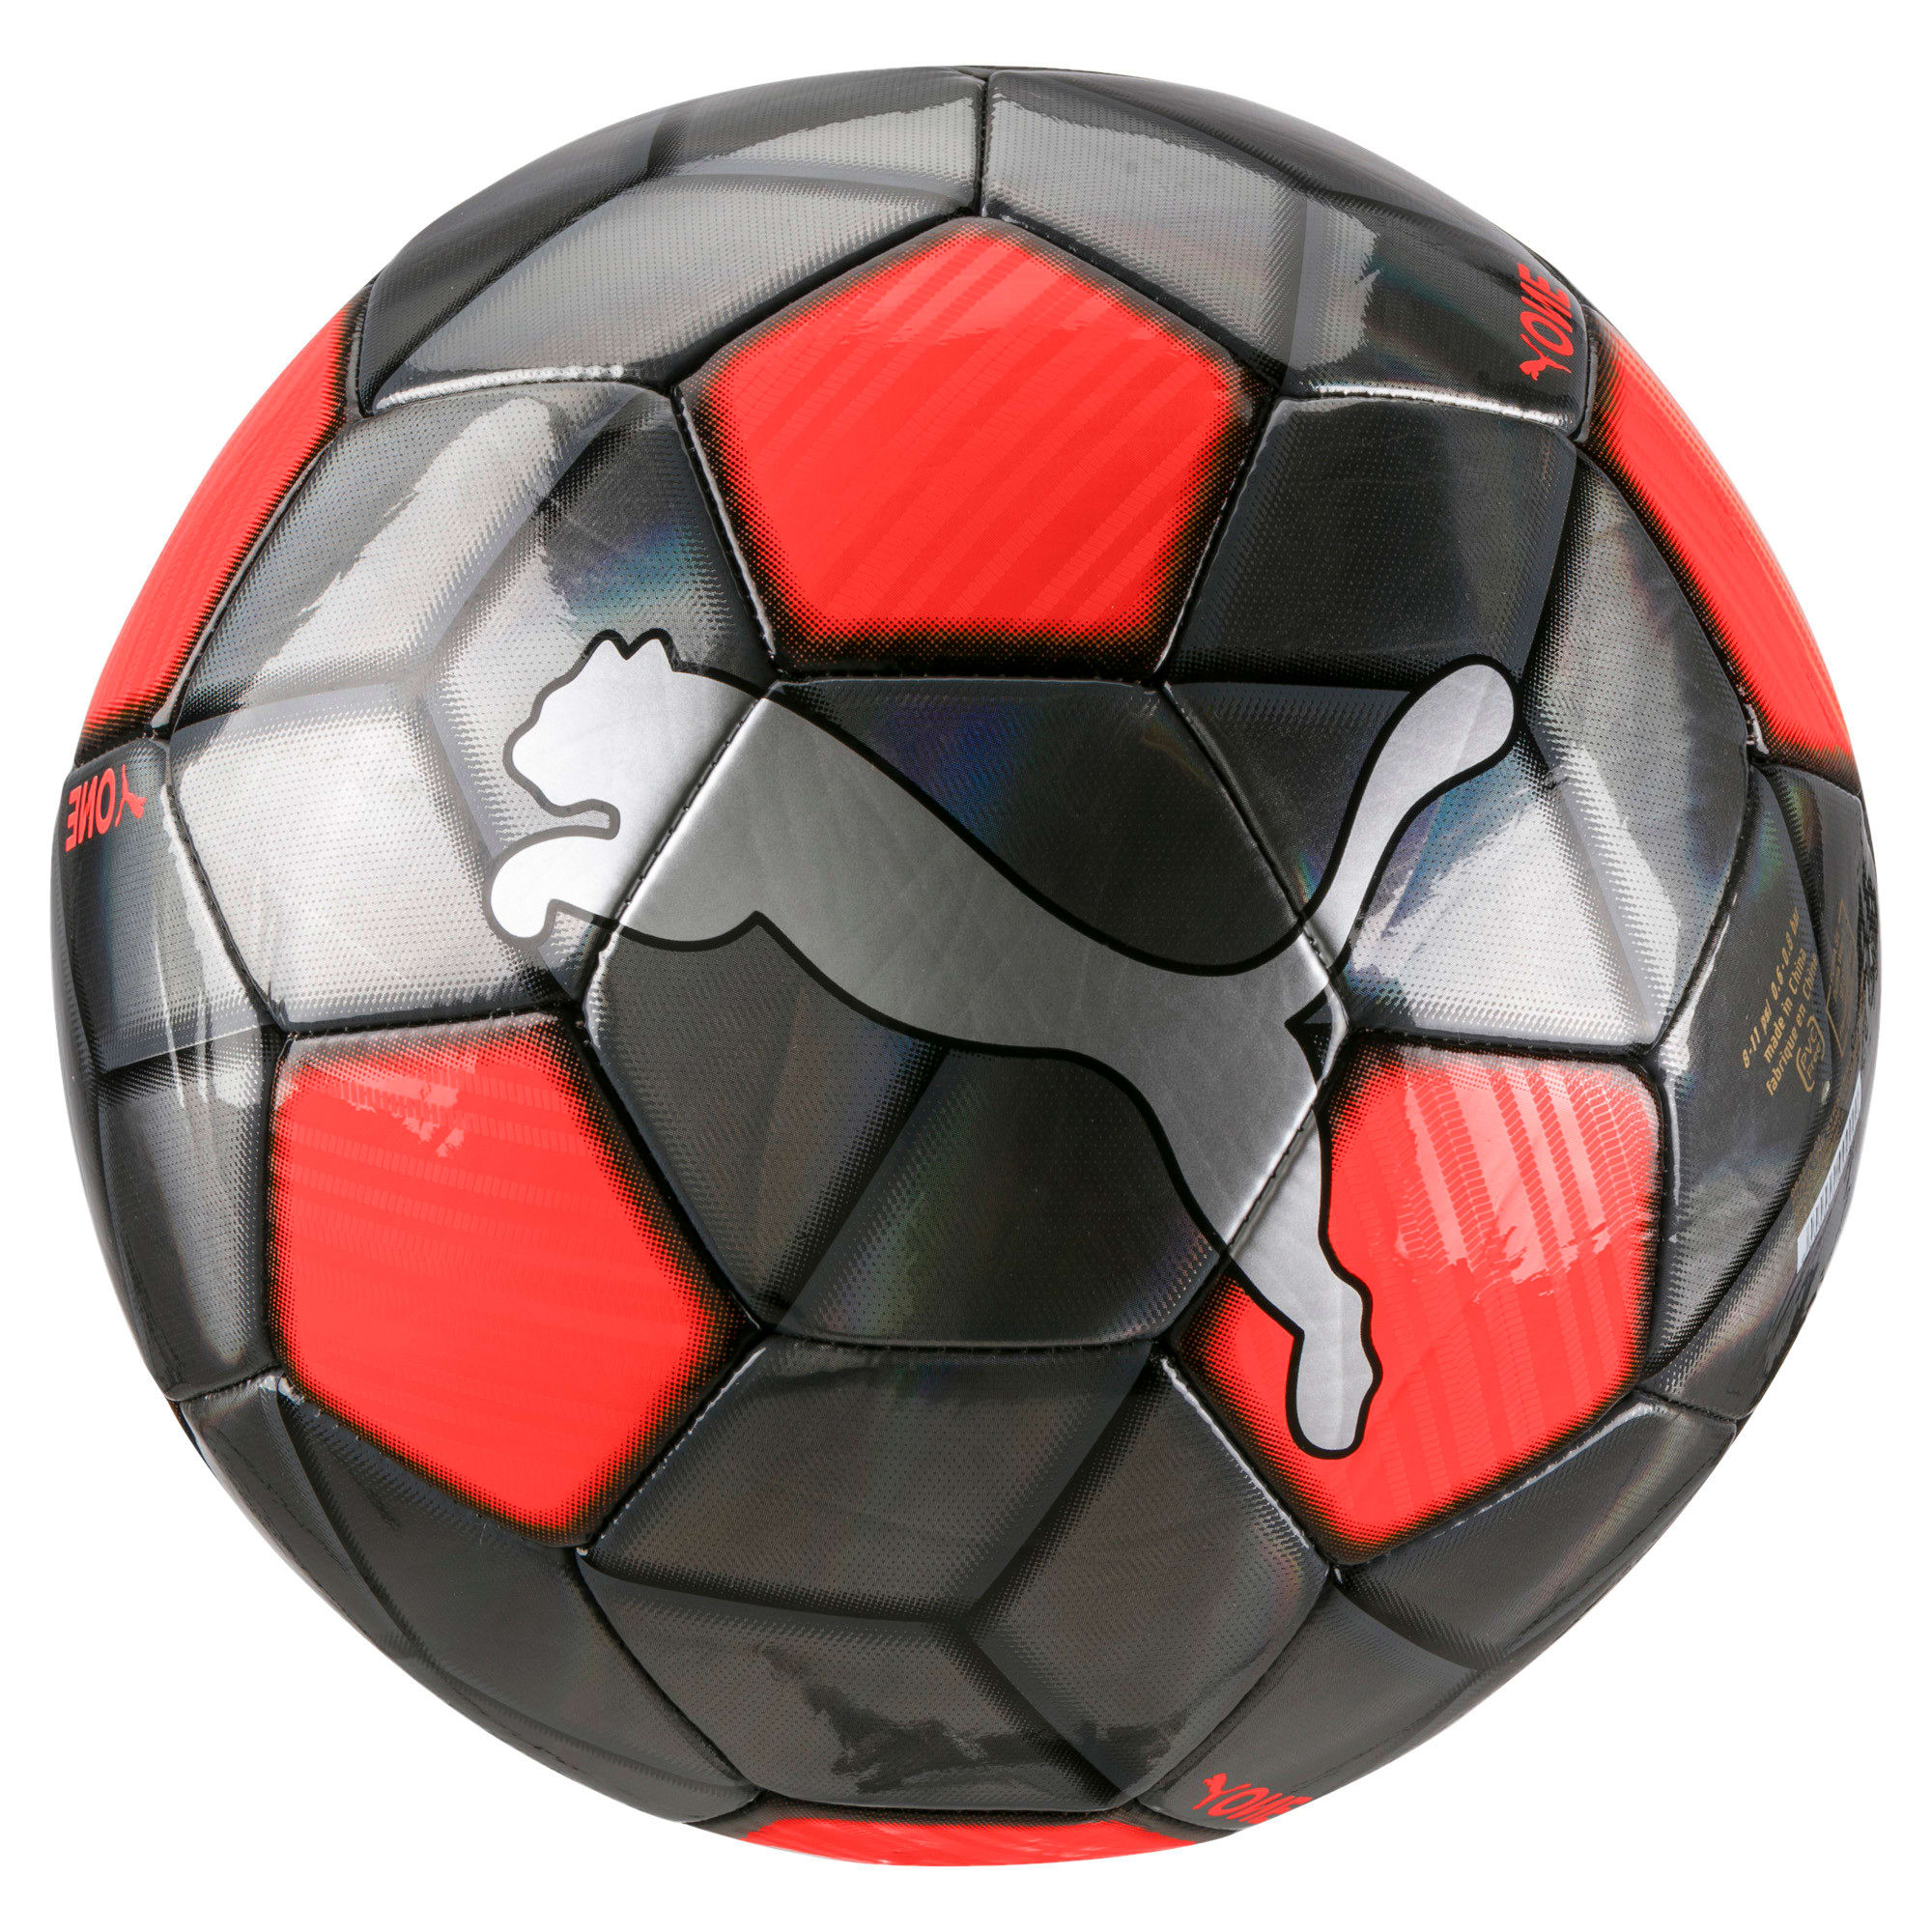 Thumbnail 1 of PUMA One Strap Football, Silver-Nrgy Red-Puma Black, medium